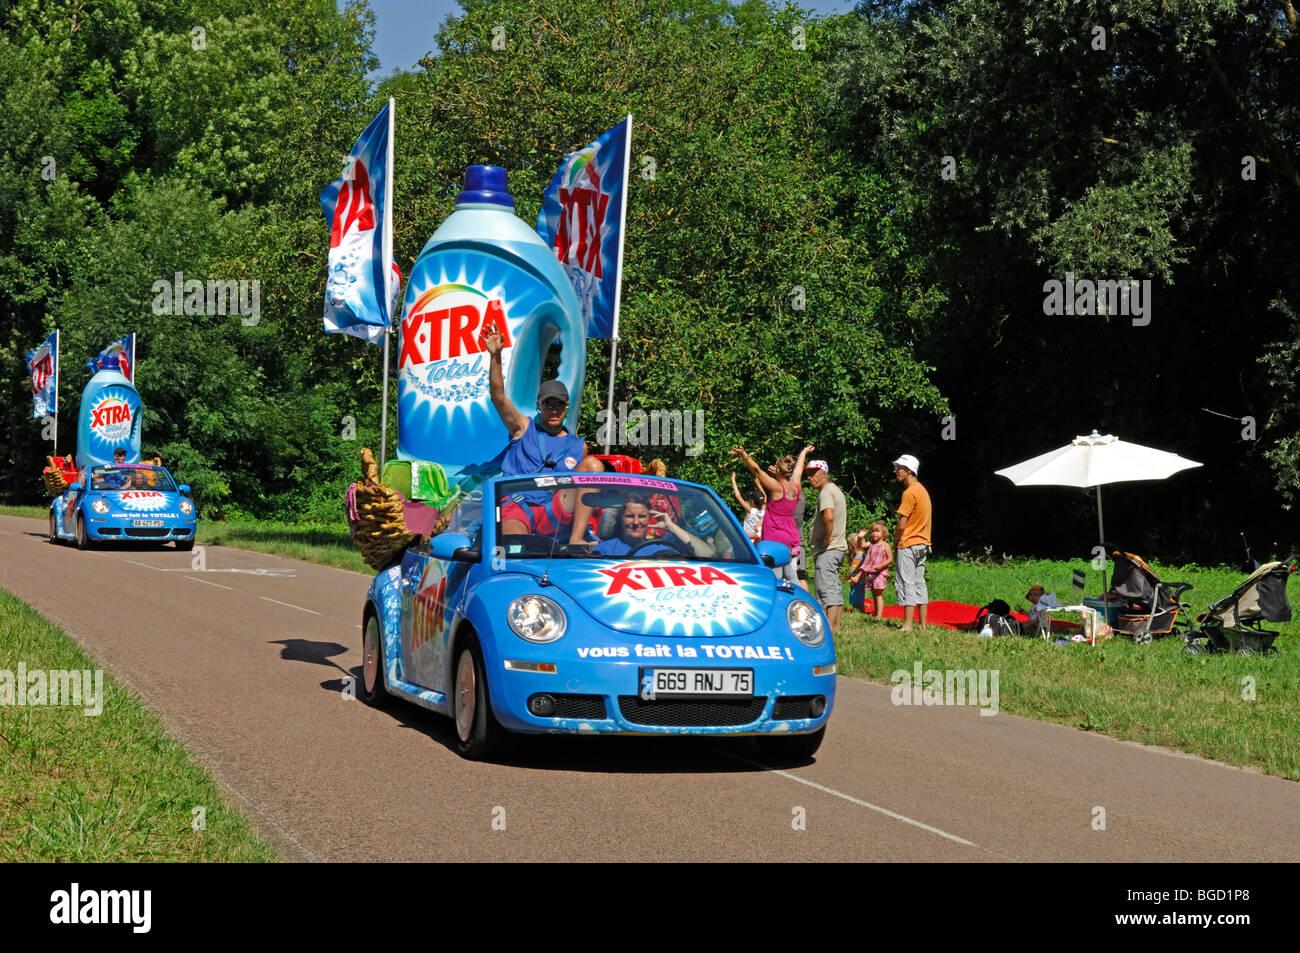 Tour de France 2009 publicity caravan at Commissery, near Tonnerre in the Yonne (89) departement of France - Stock Image